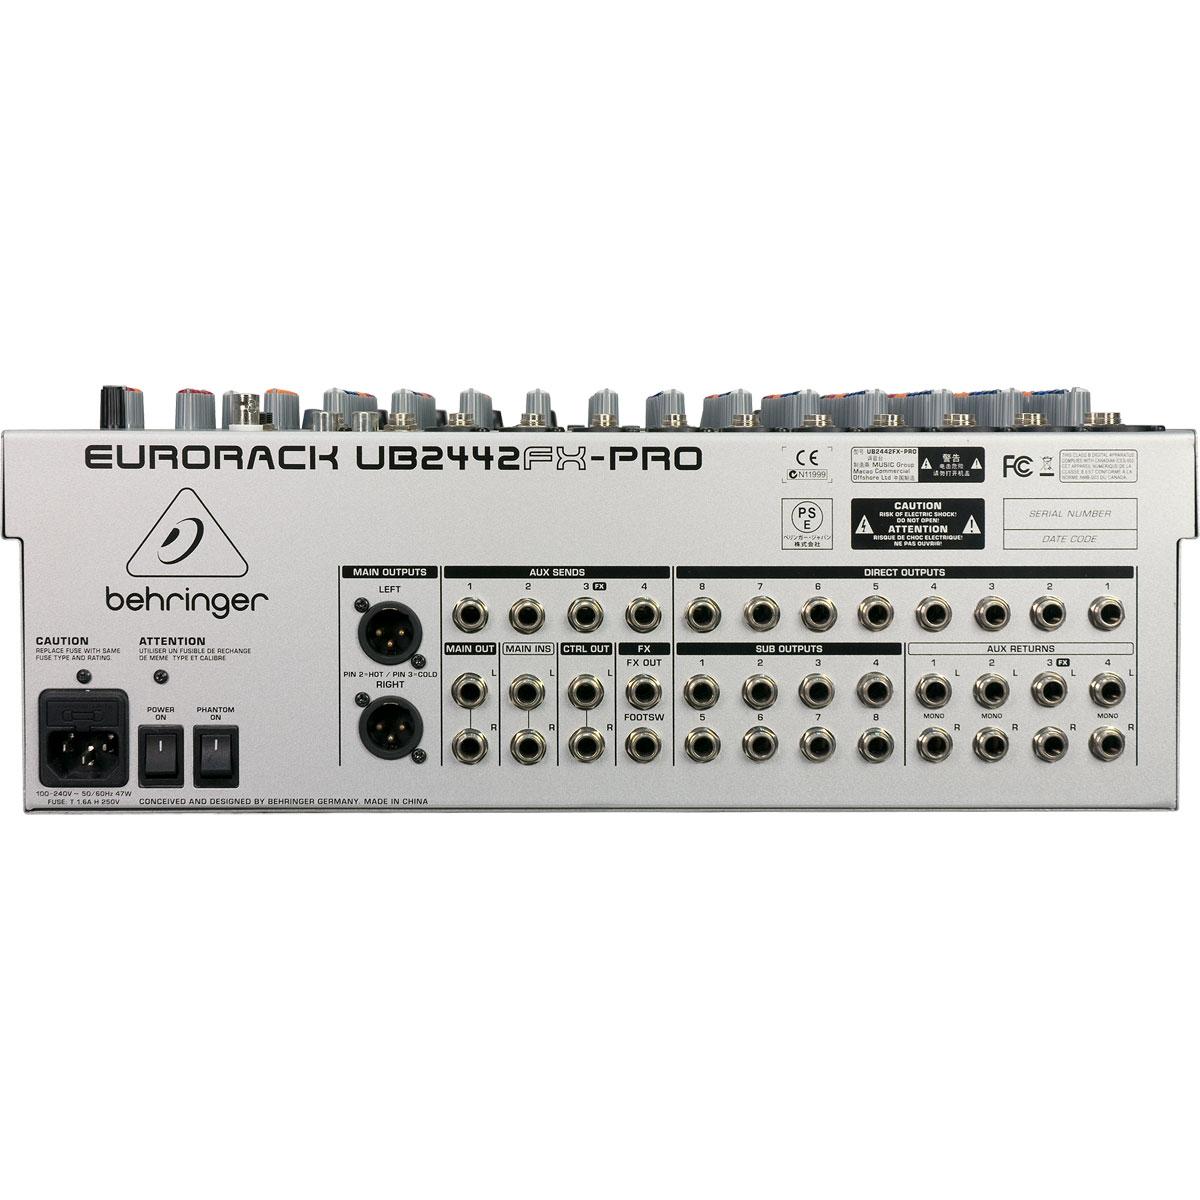 UB2442FXPRO - Mesa de Som / Mixer 24 Canais Eurorack UB 2442 FX PRO - Behringer